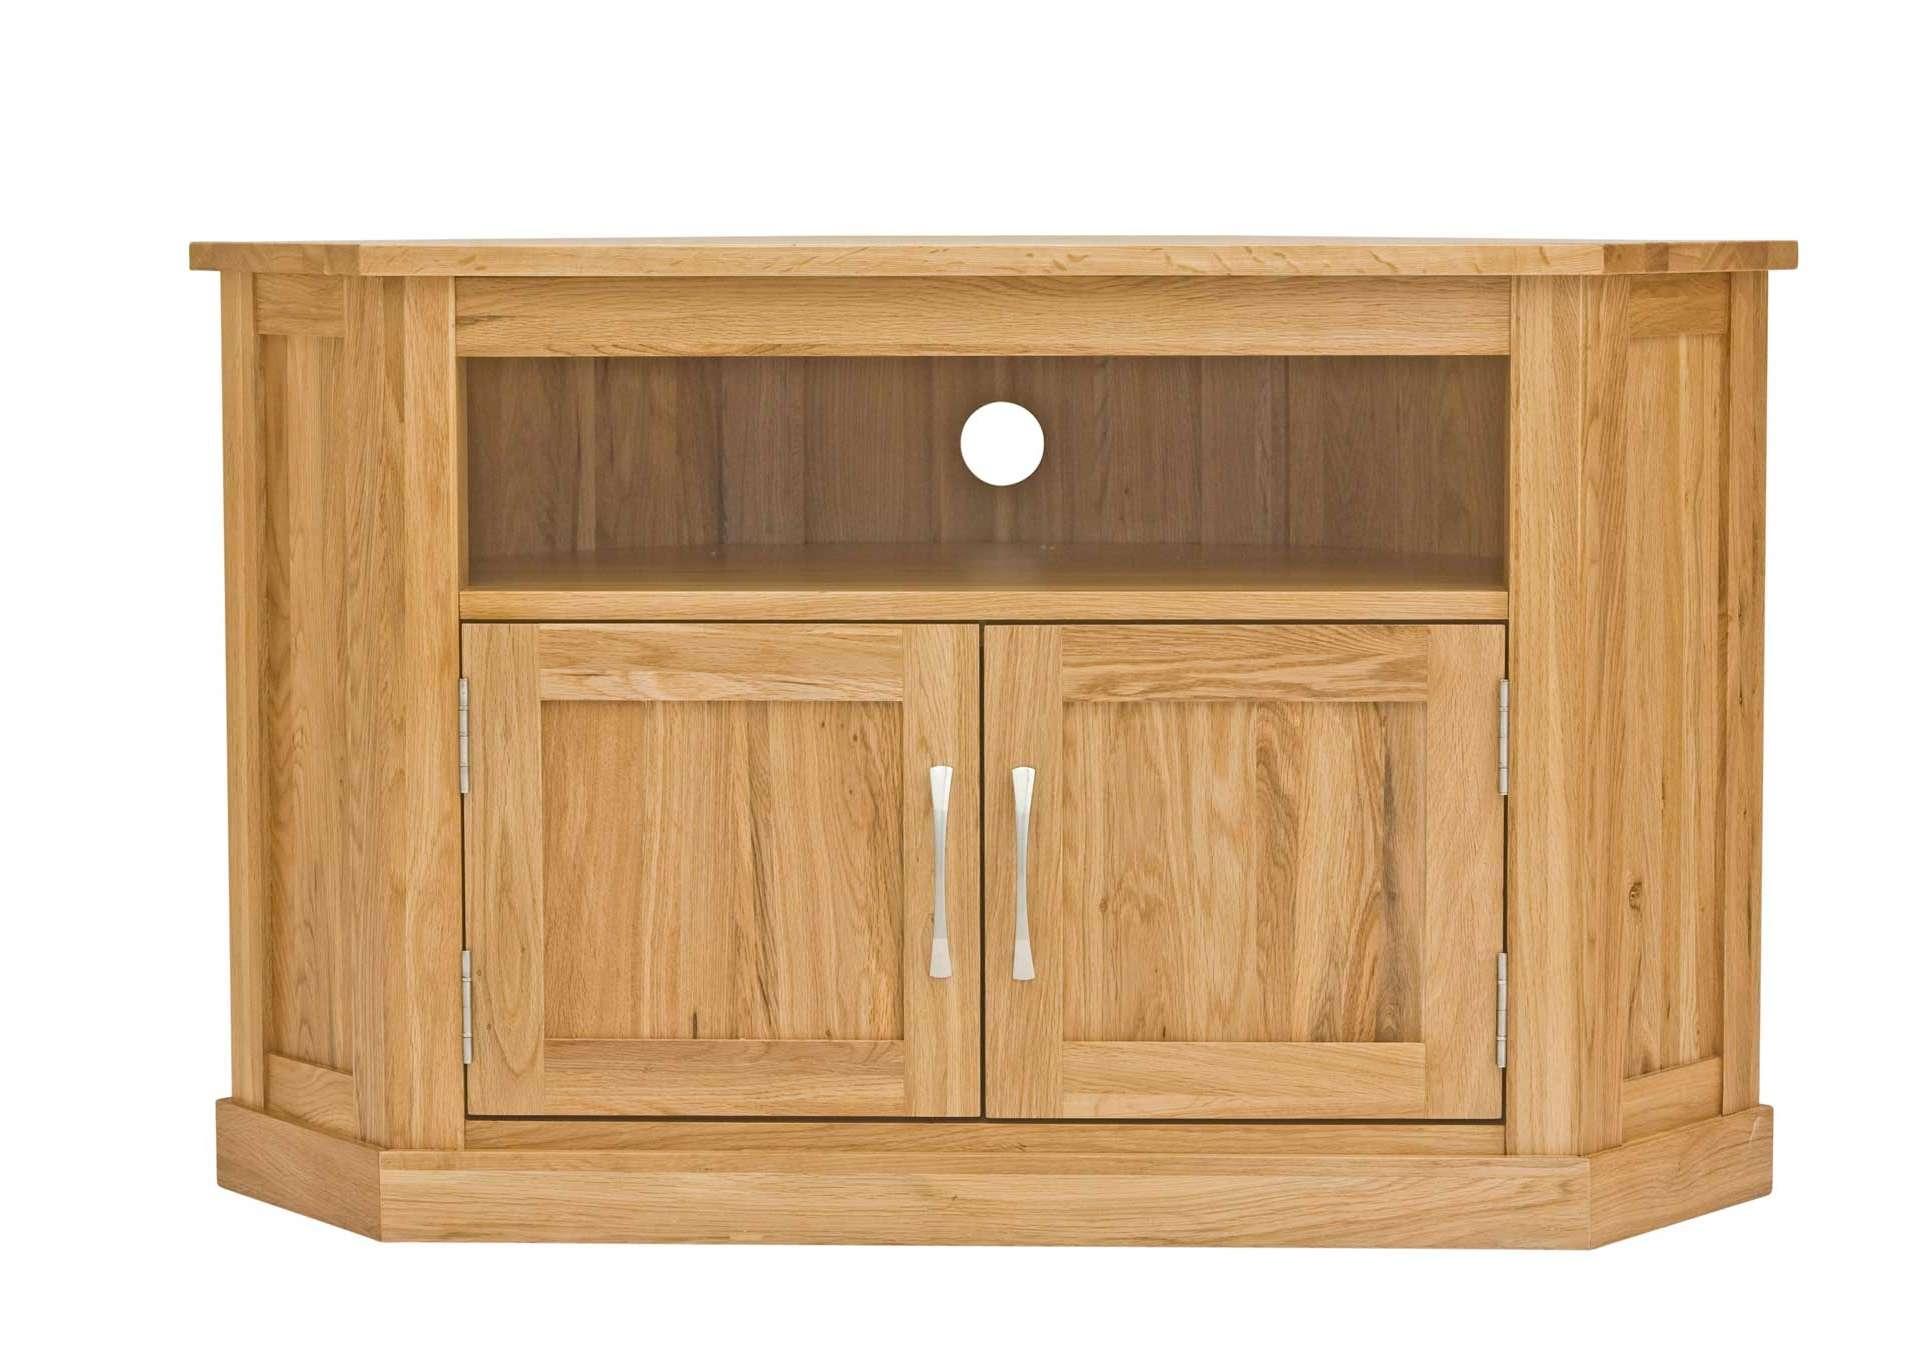 Classic Oak Corner Television Cabinet | Hampshire Furniture Inside Dark Wood Corner Tv Stands (View 1 of 15)